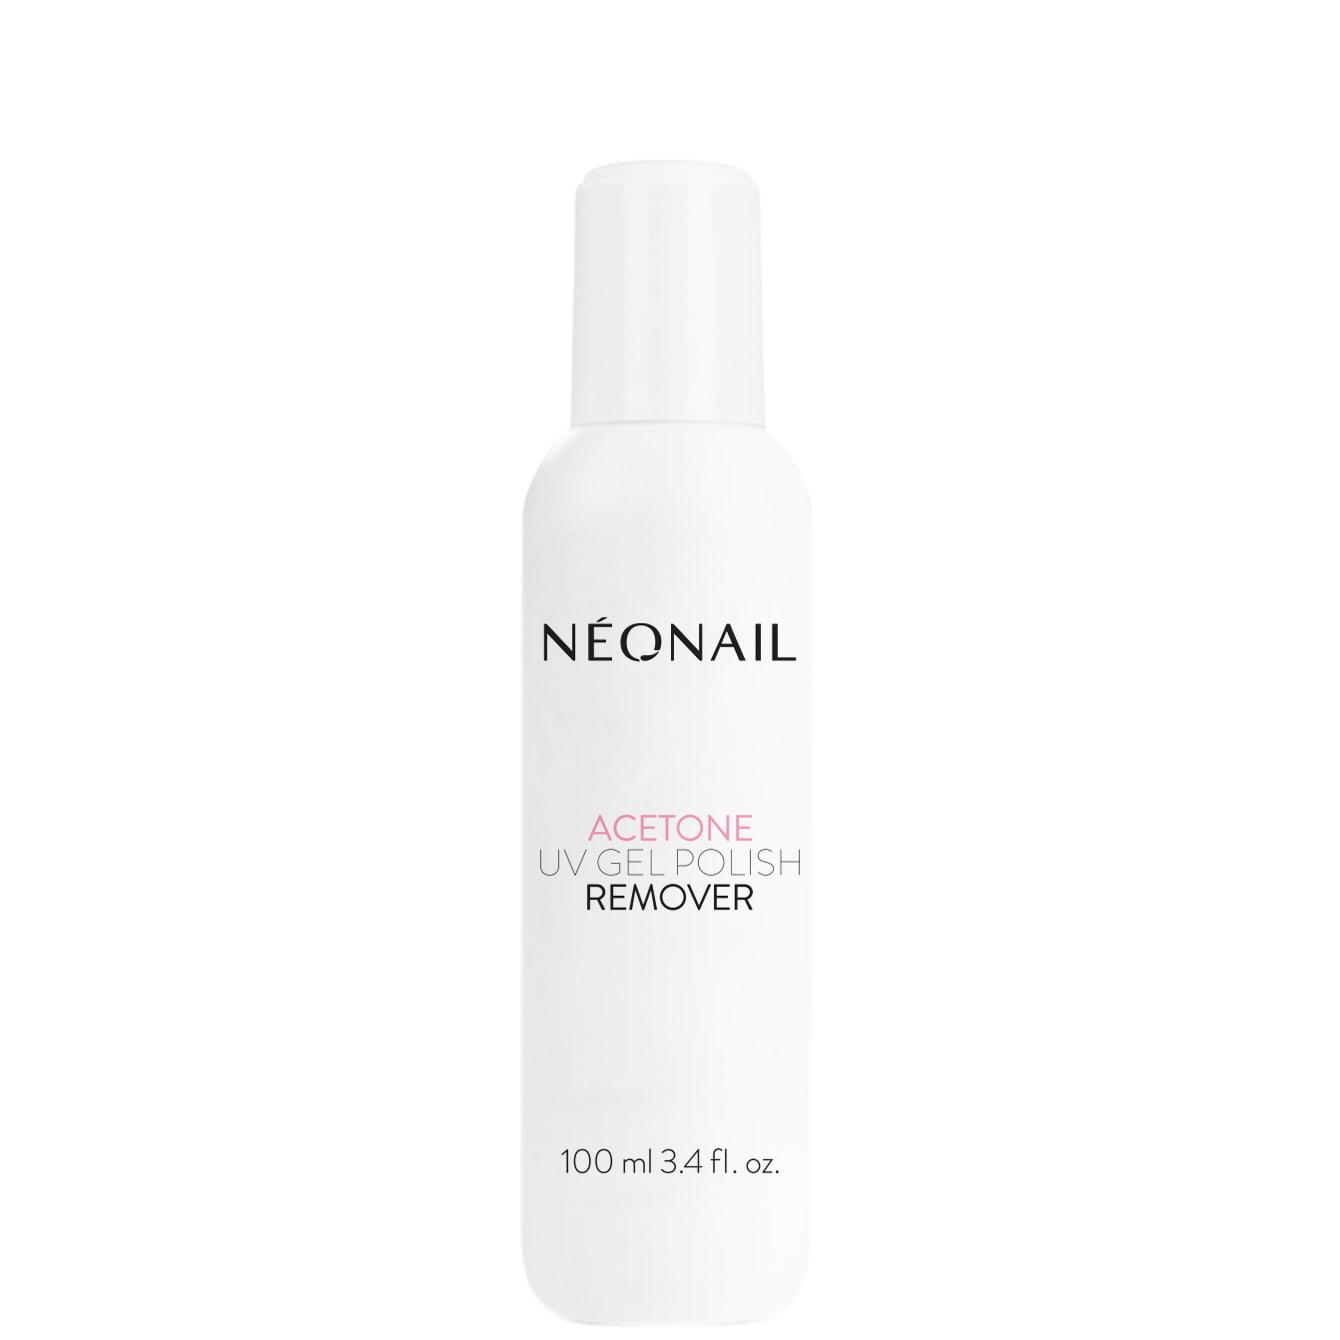 Acetone UV Gel Polish Remover - Aceton 100 ml do usuwania manicure hybrydowego